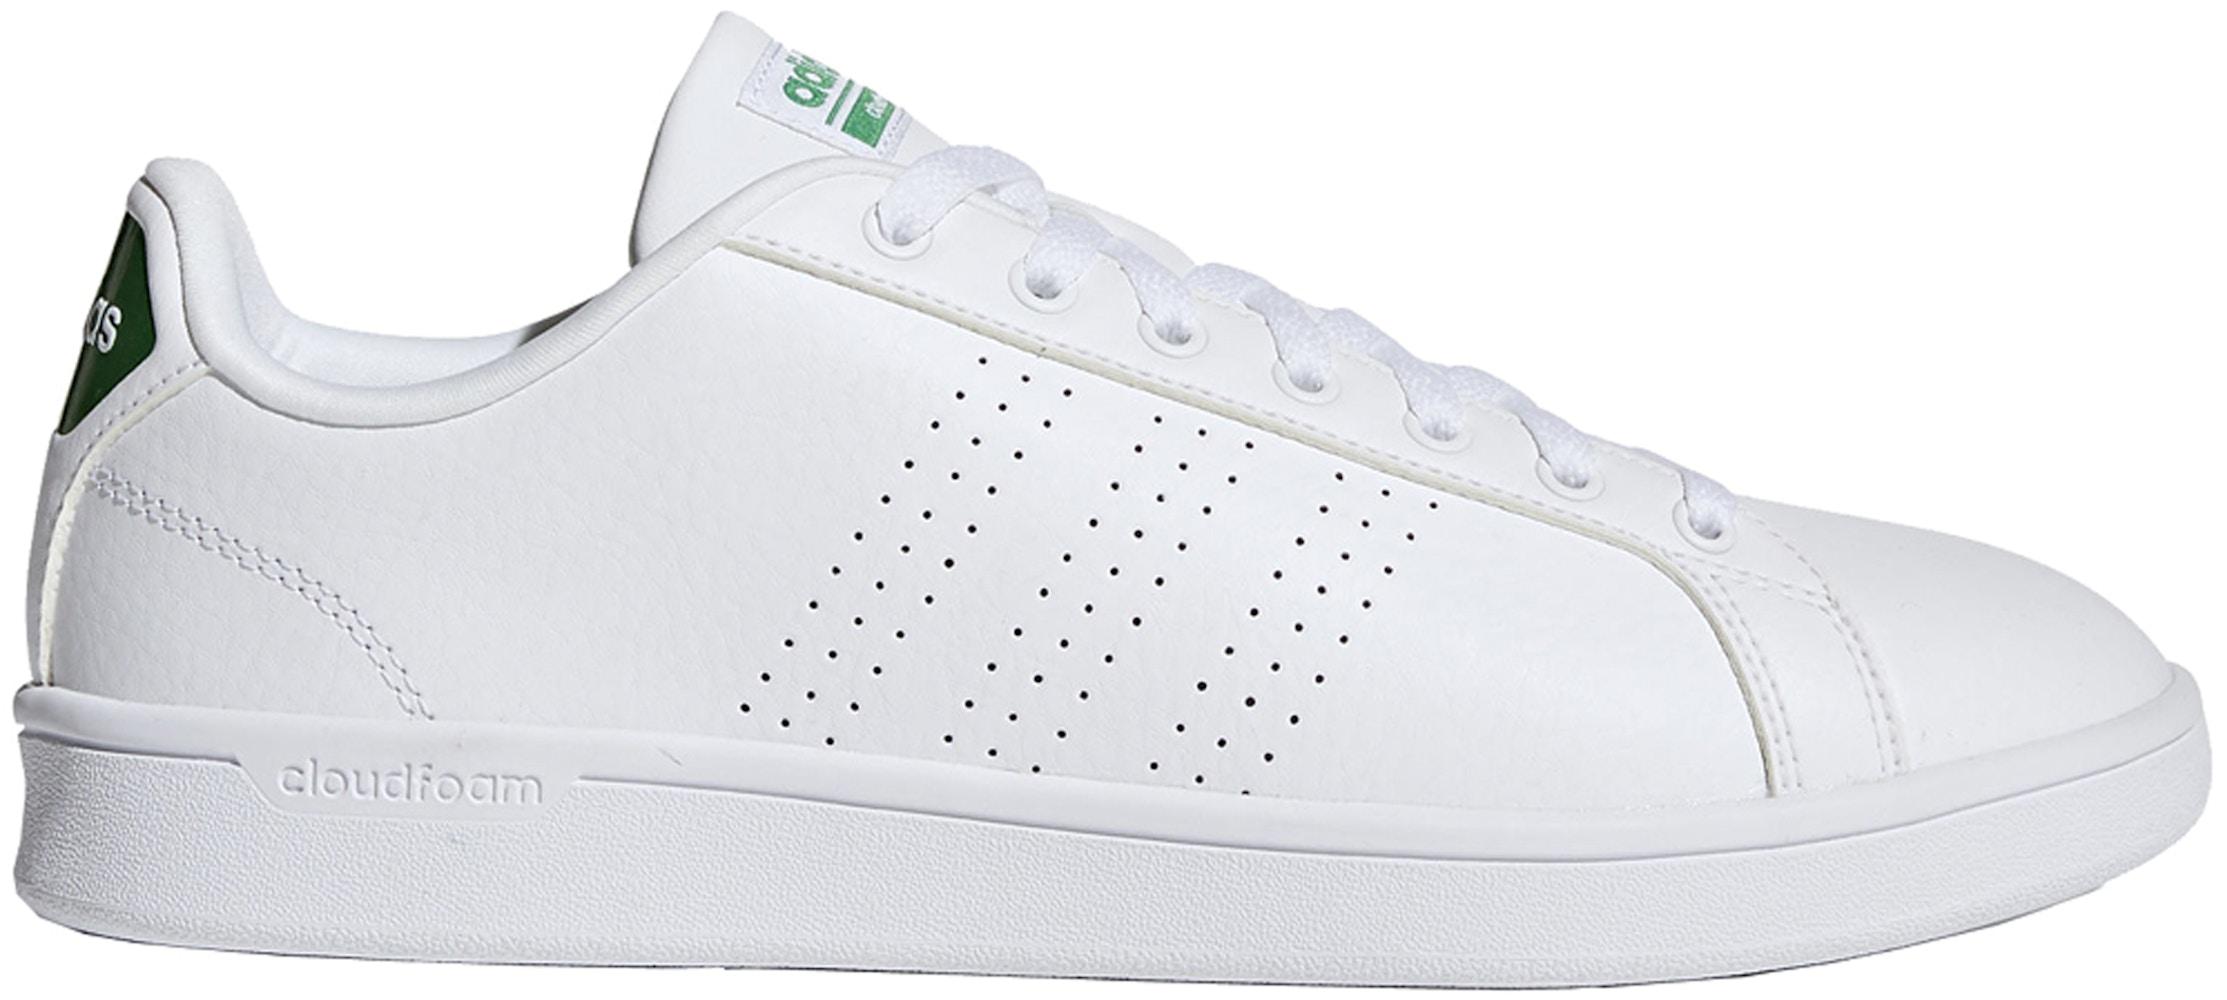 adidas Cloudfoam Advantage Clean White Green